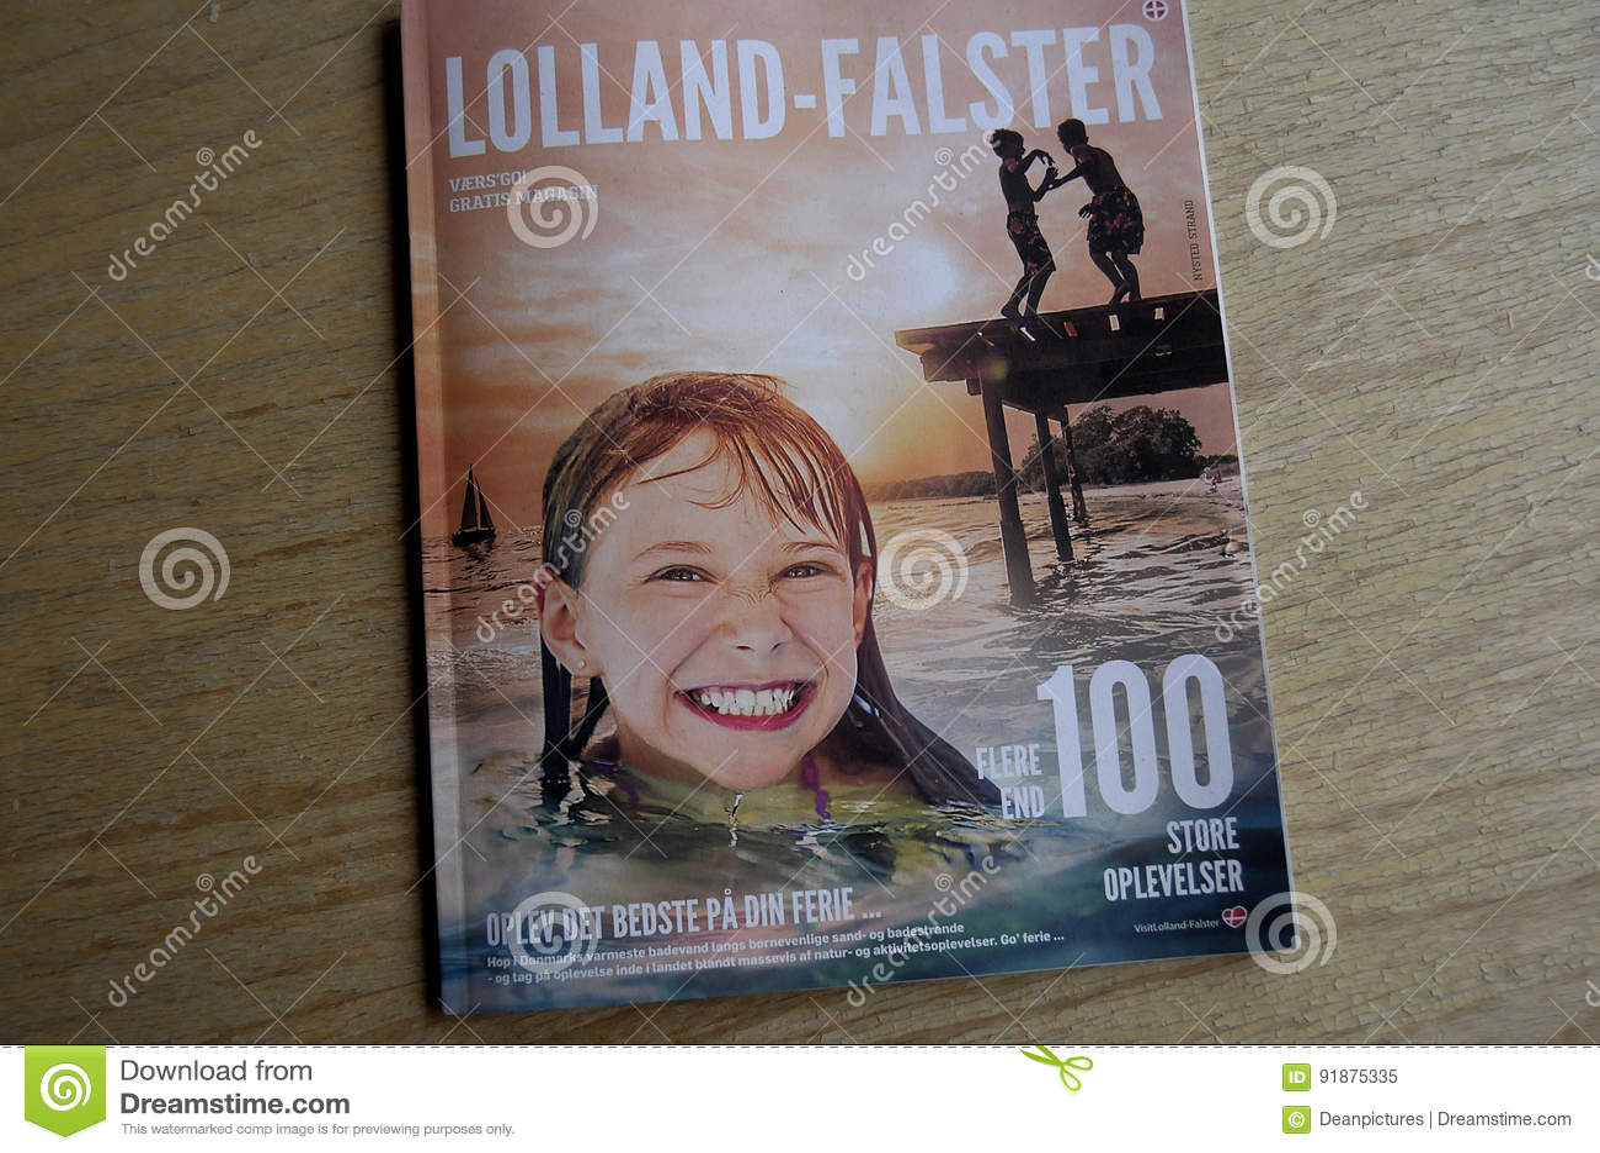 LOLLAND - FALSTER turystów katalog